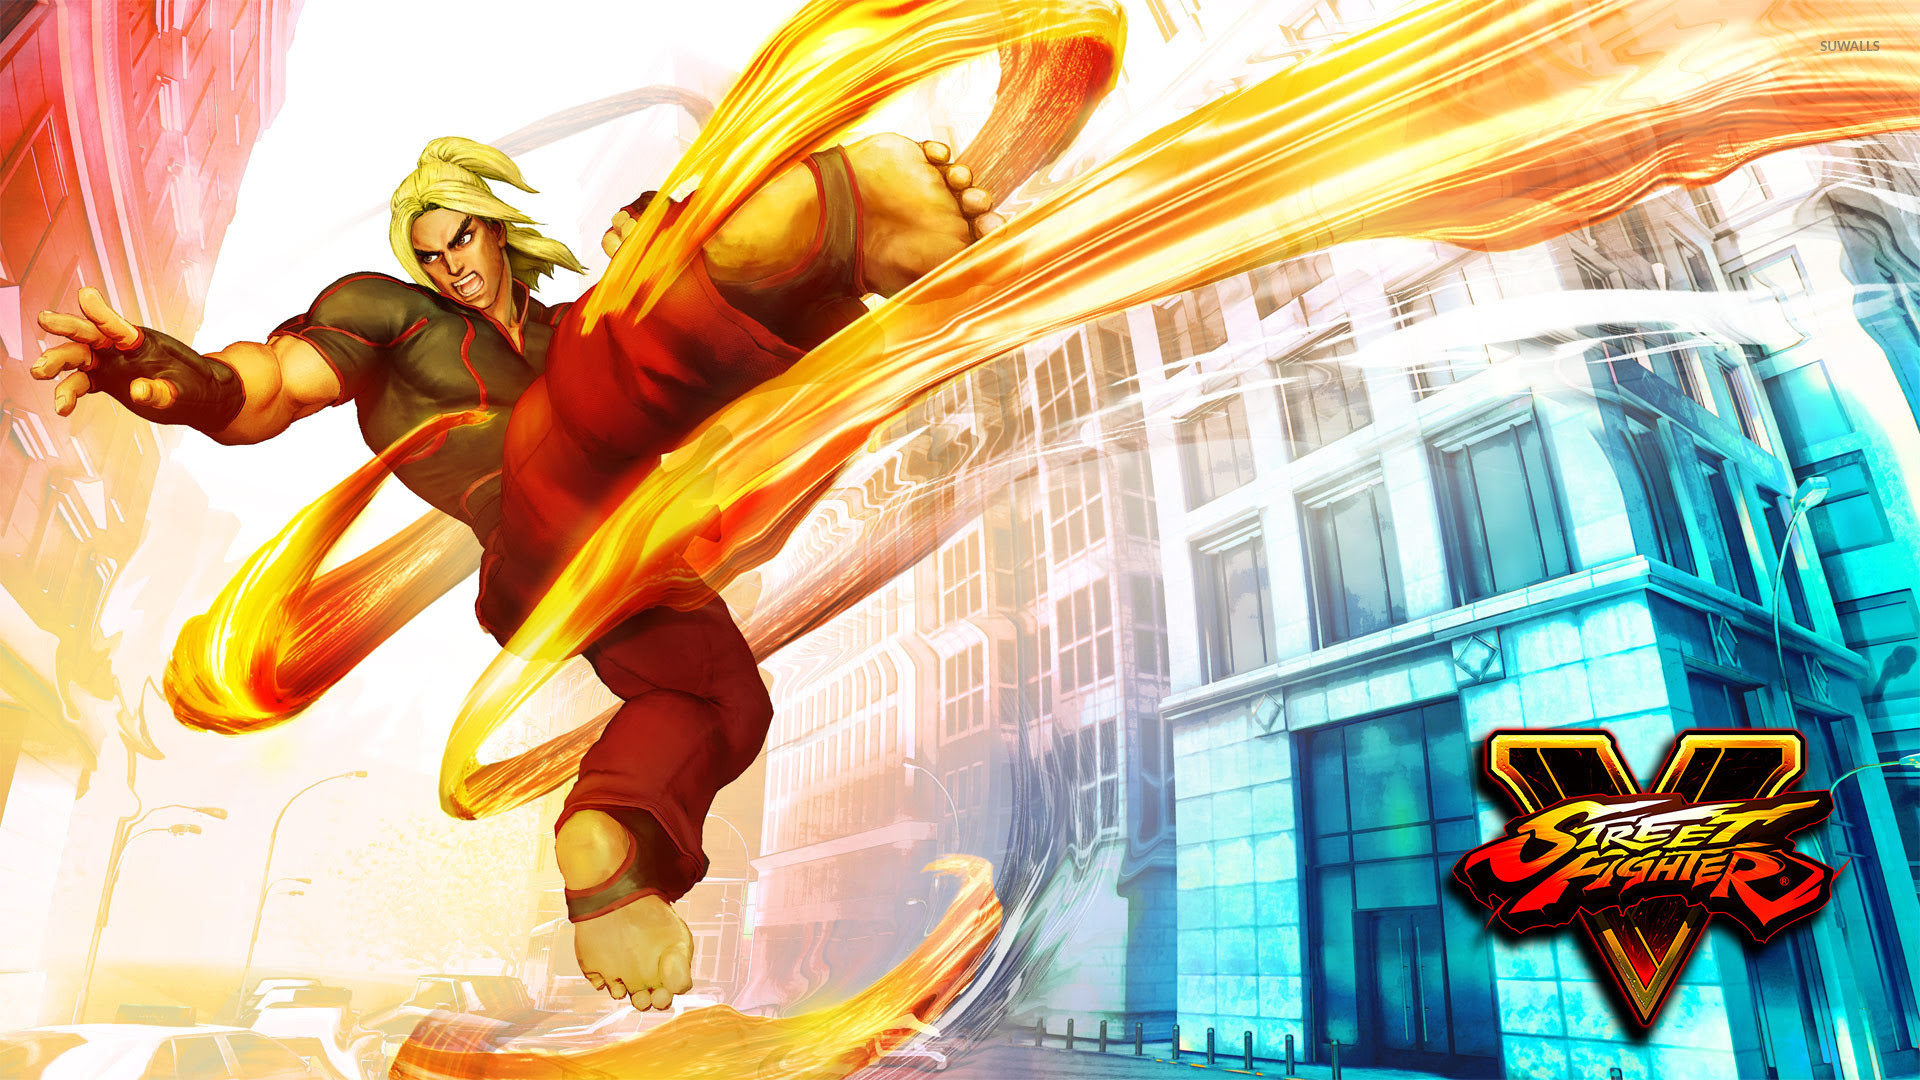 Street Fighter V Wallpaper 57 Images